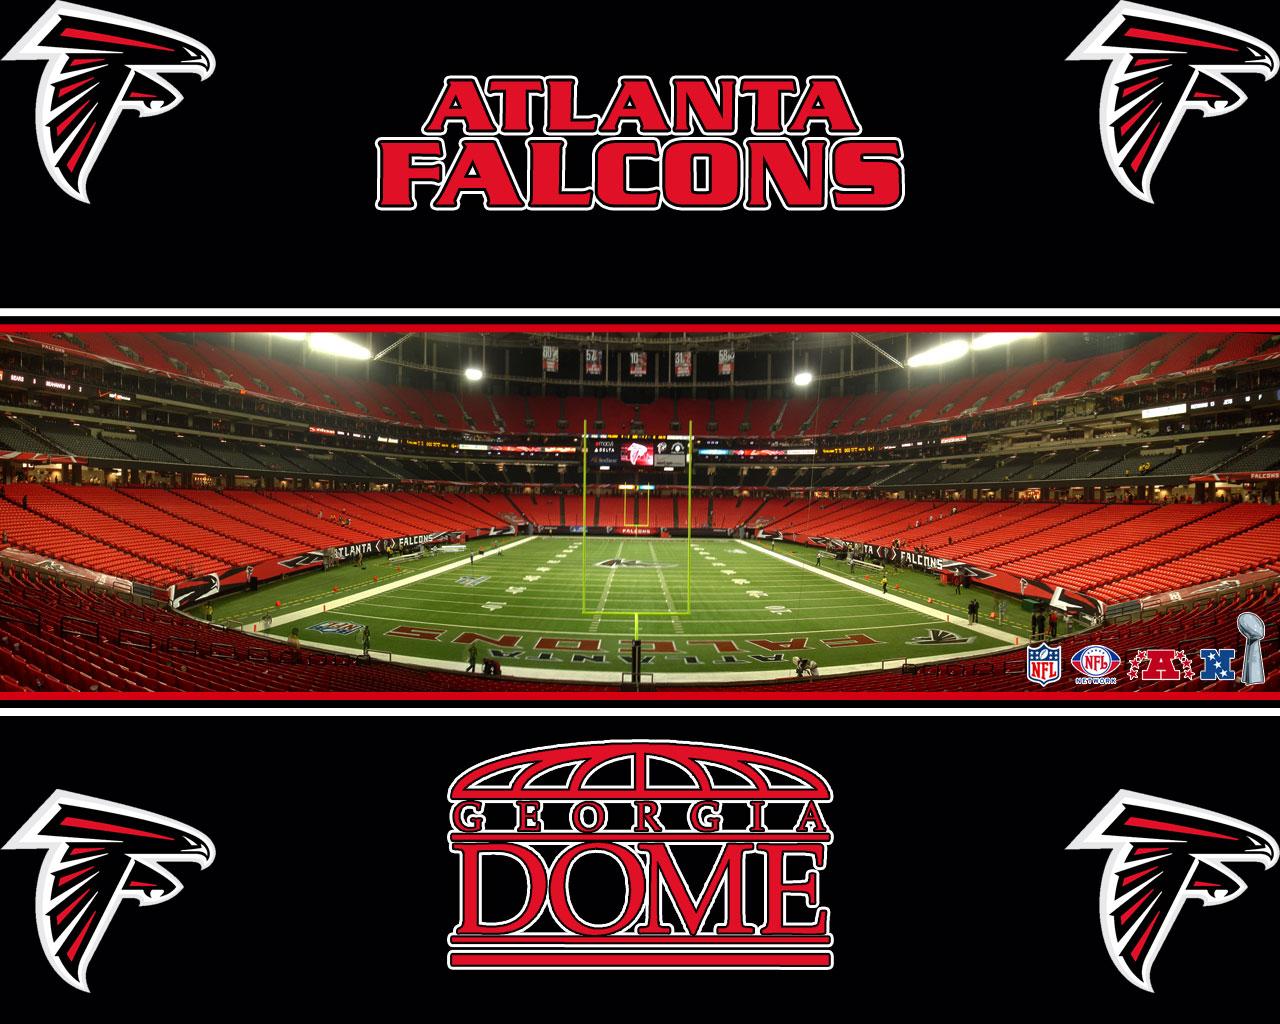 Hd Car Wallpapers Trends Image Atlanta Falcons Images